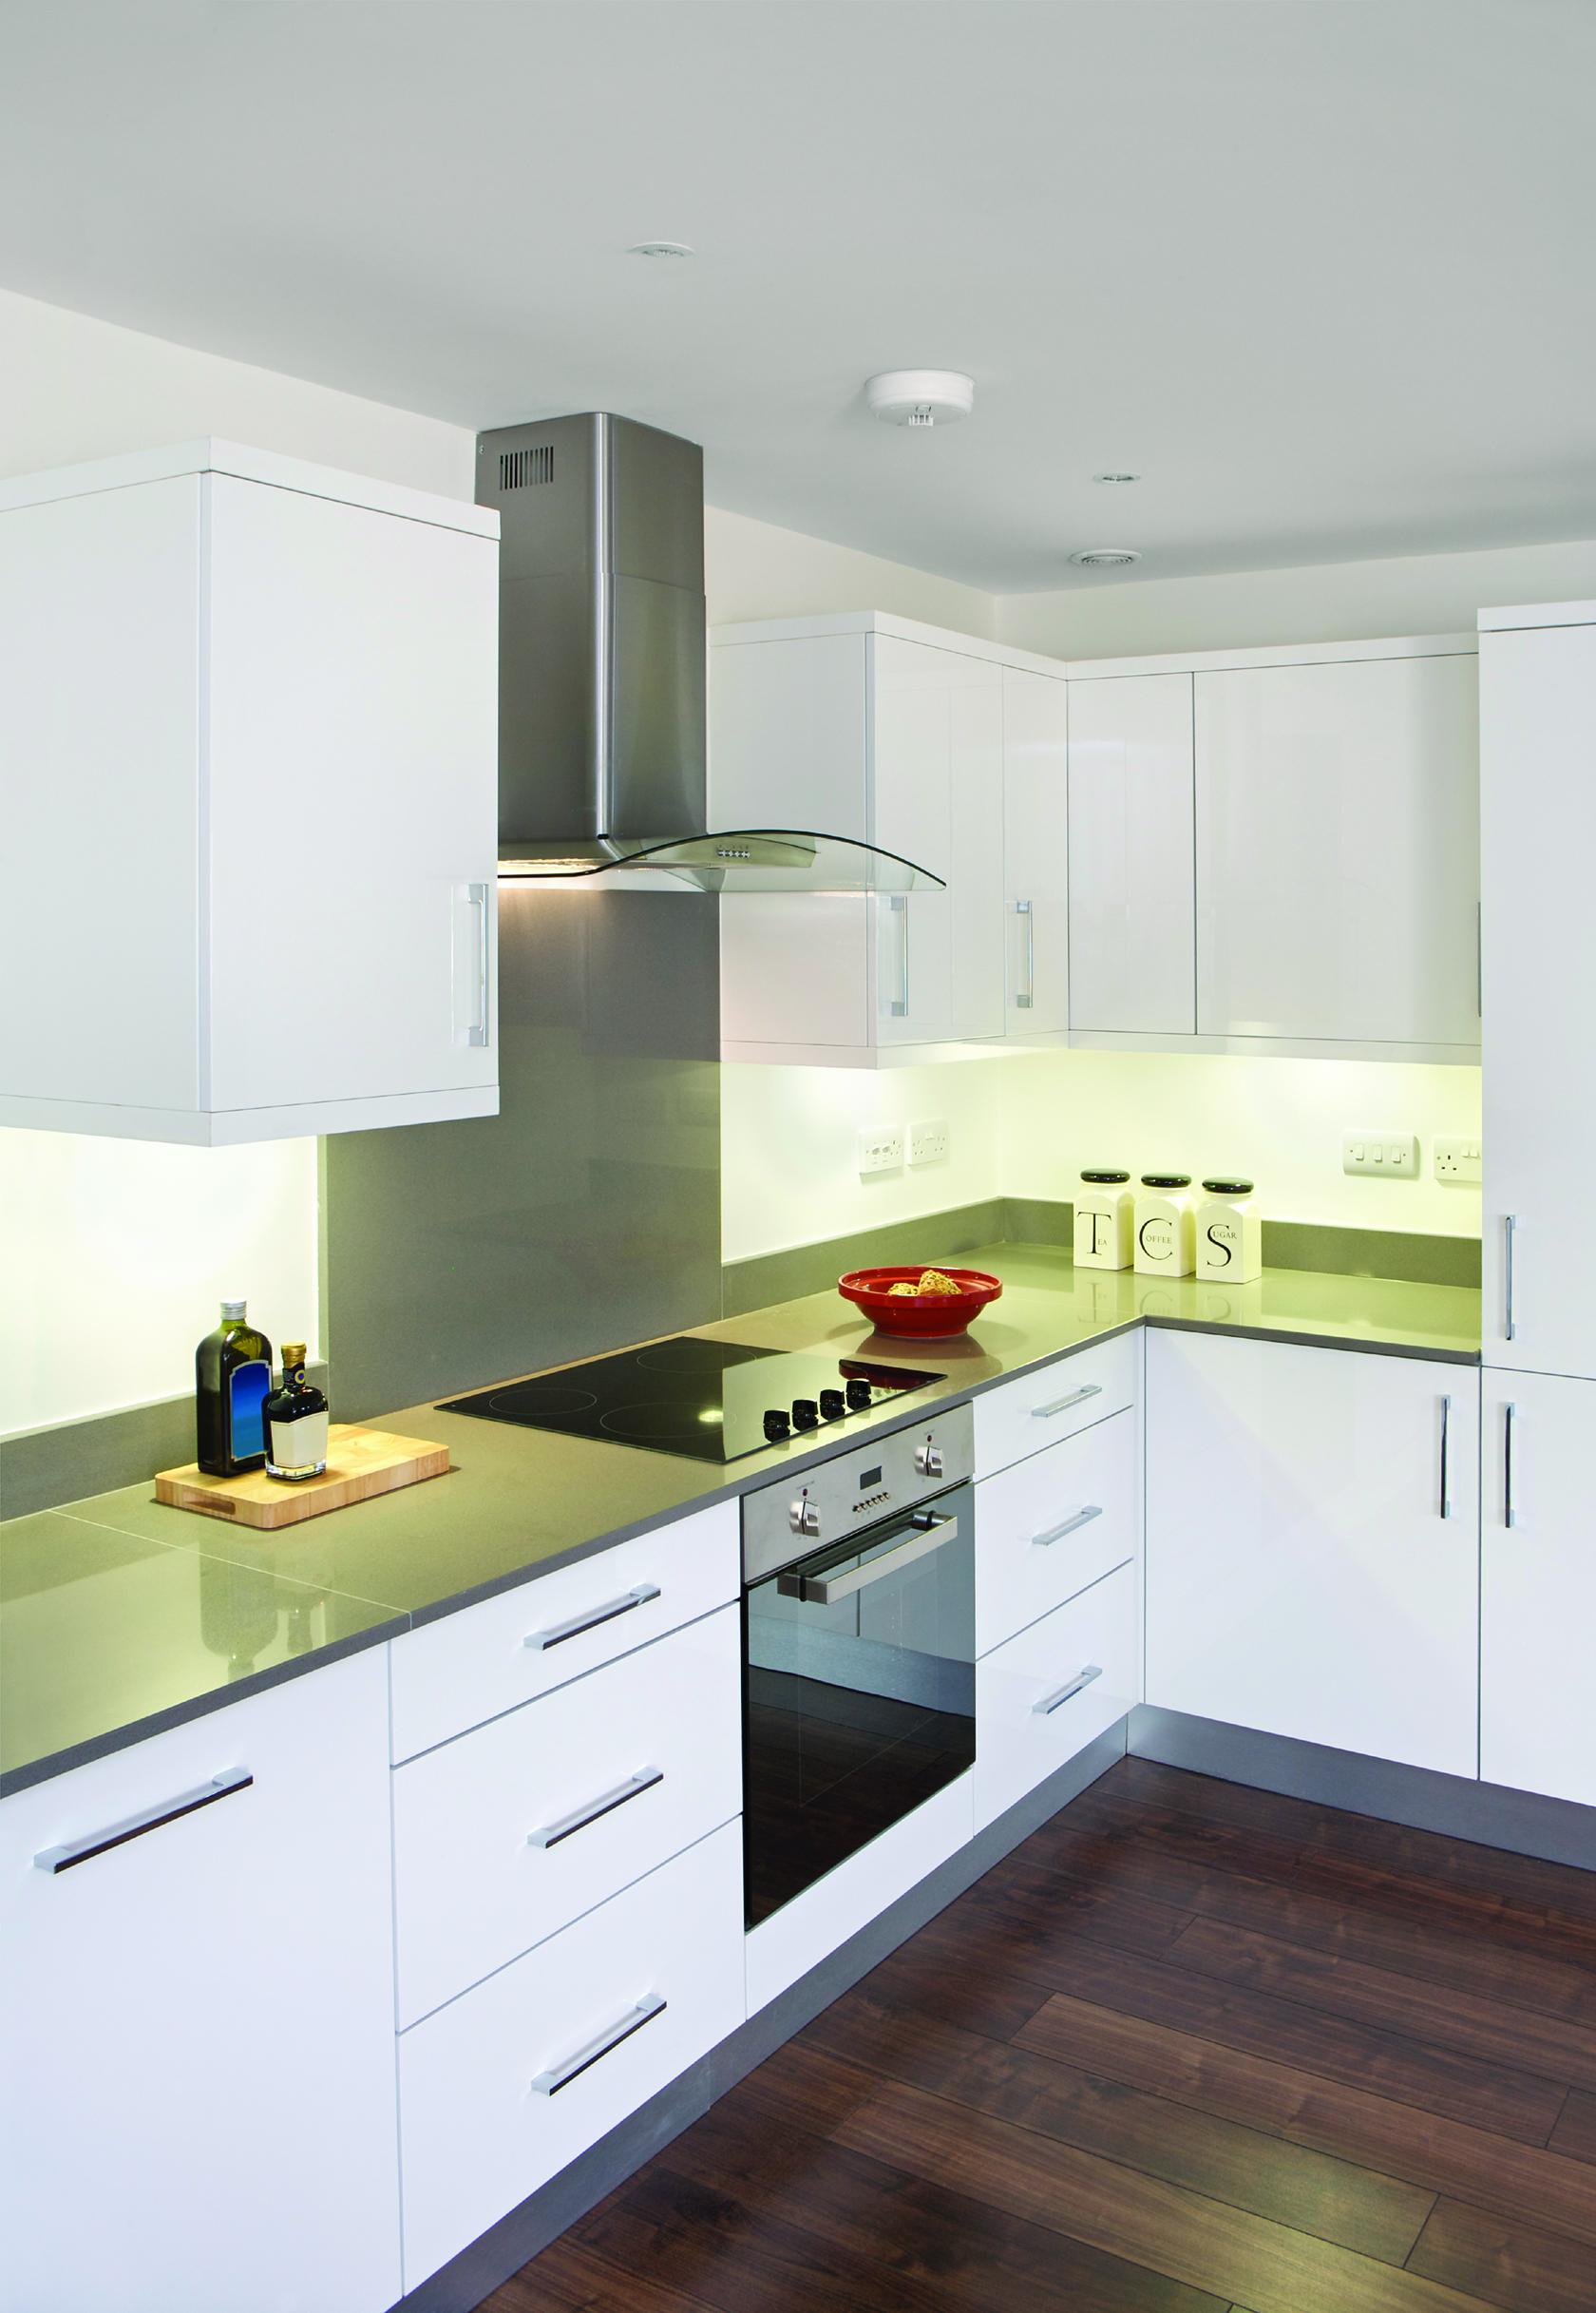 A_kitchen_lit_with_bright_white_5000k_light.jpg